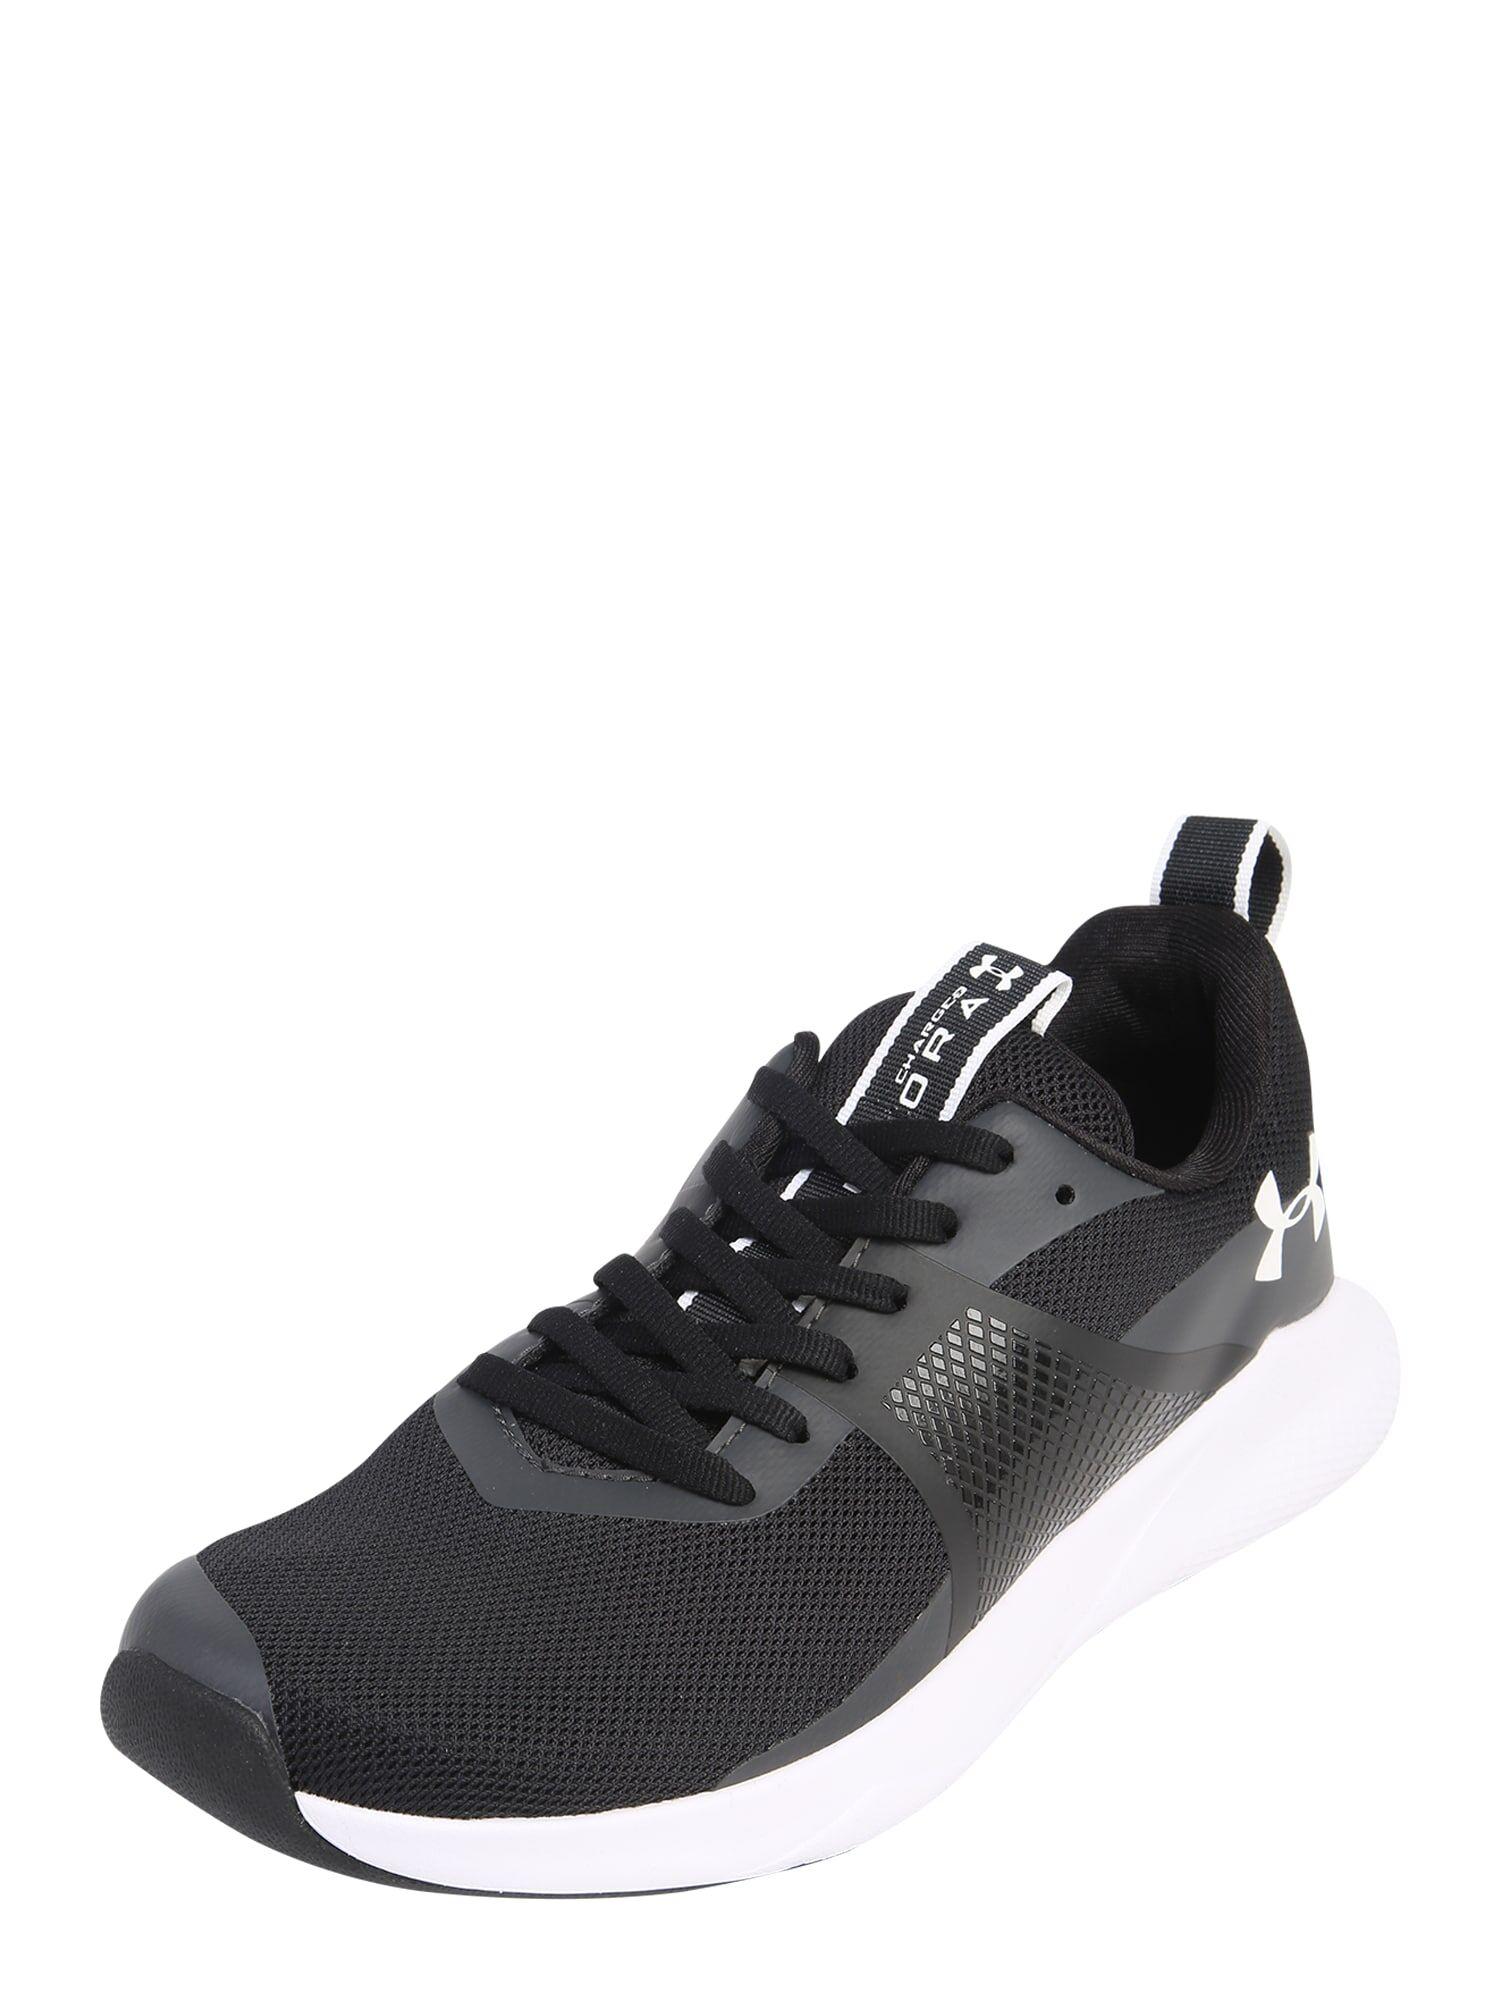 UNDER ARMOUR Chaussure de sport 'Aurora'  - Noir - Taille: 7.5 - female